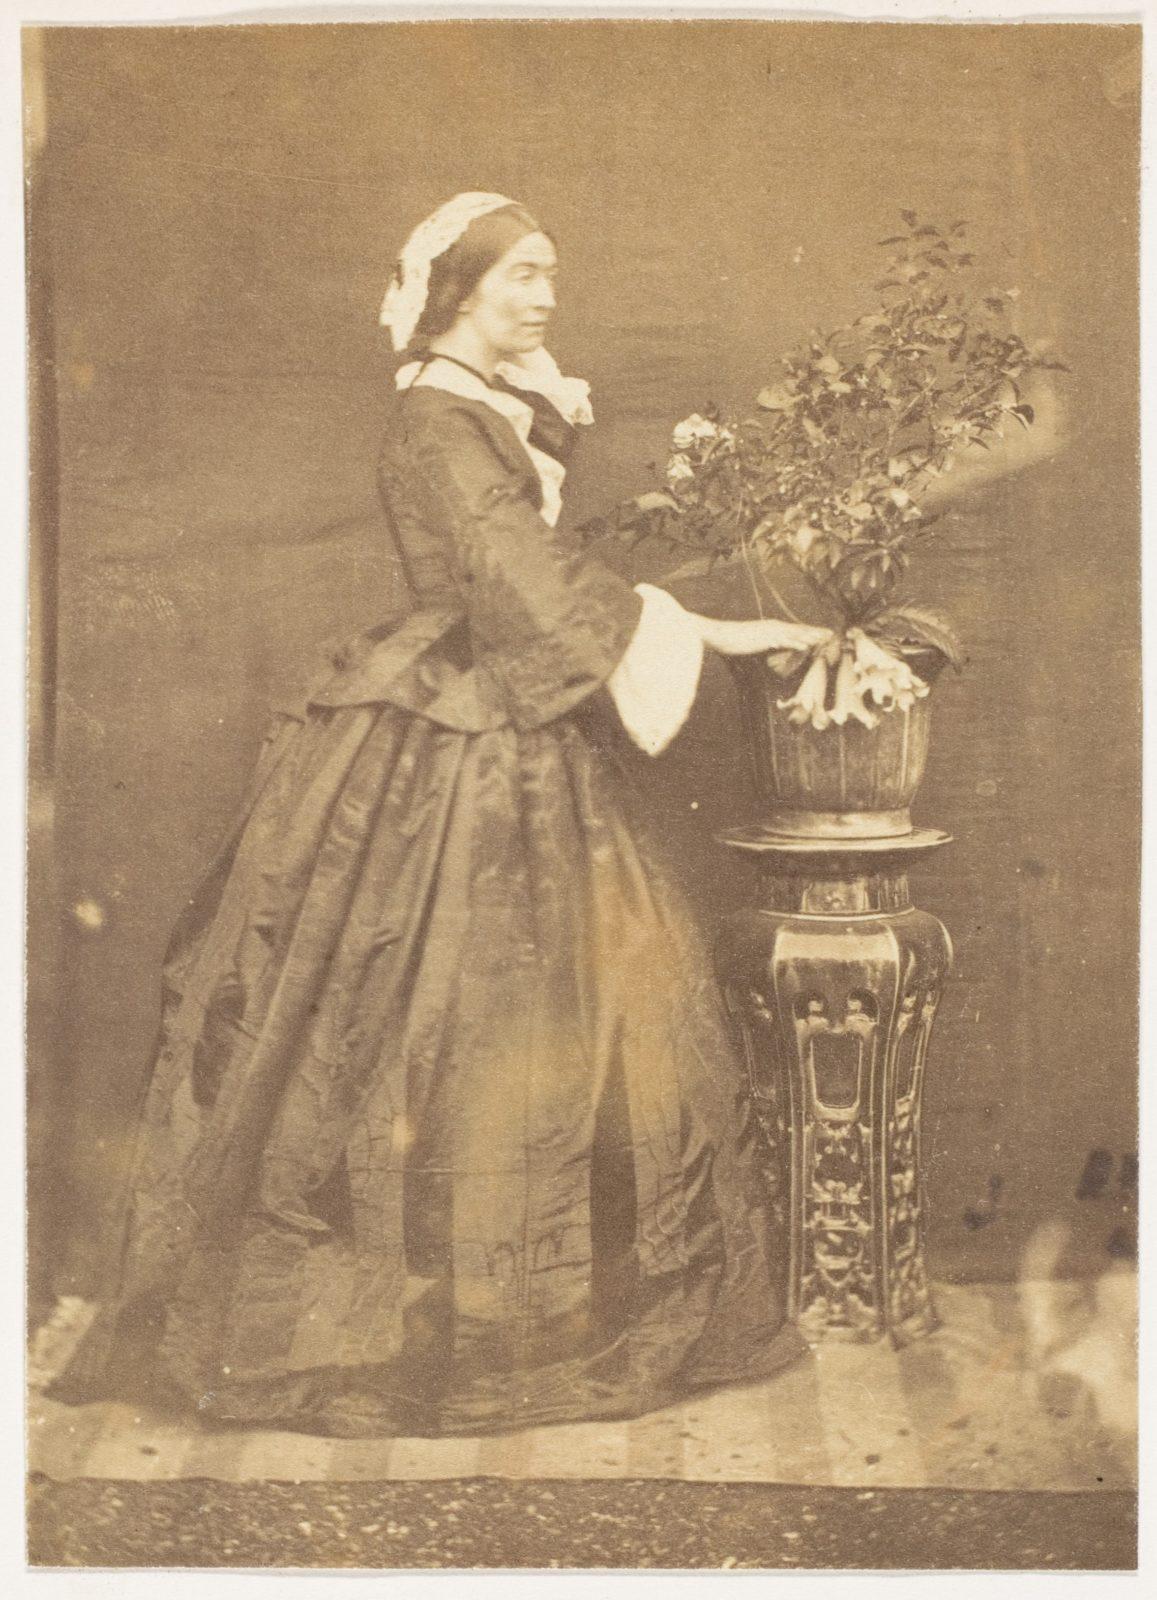 [The Viscountess Canning, Barrackpore]